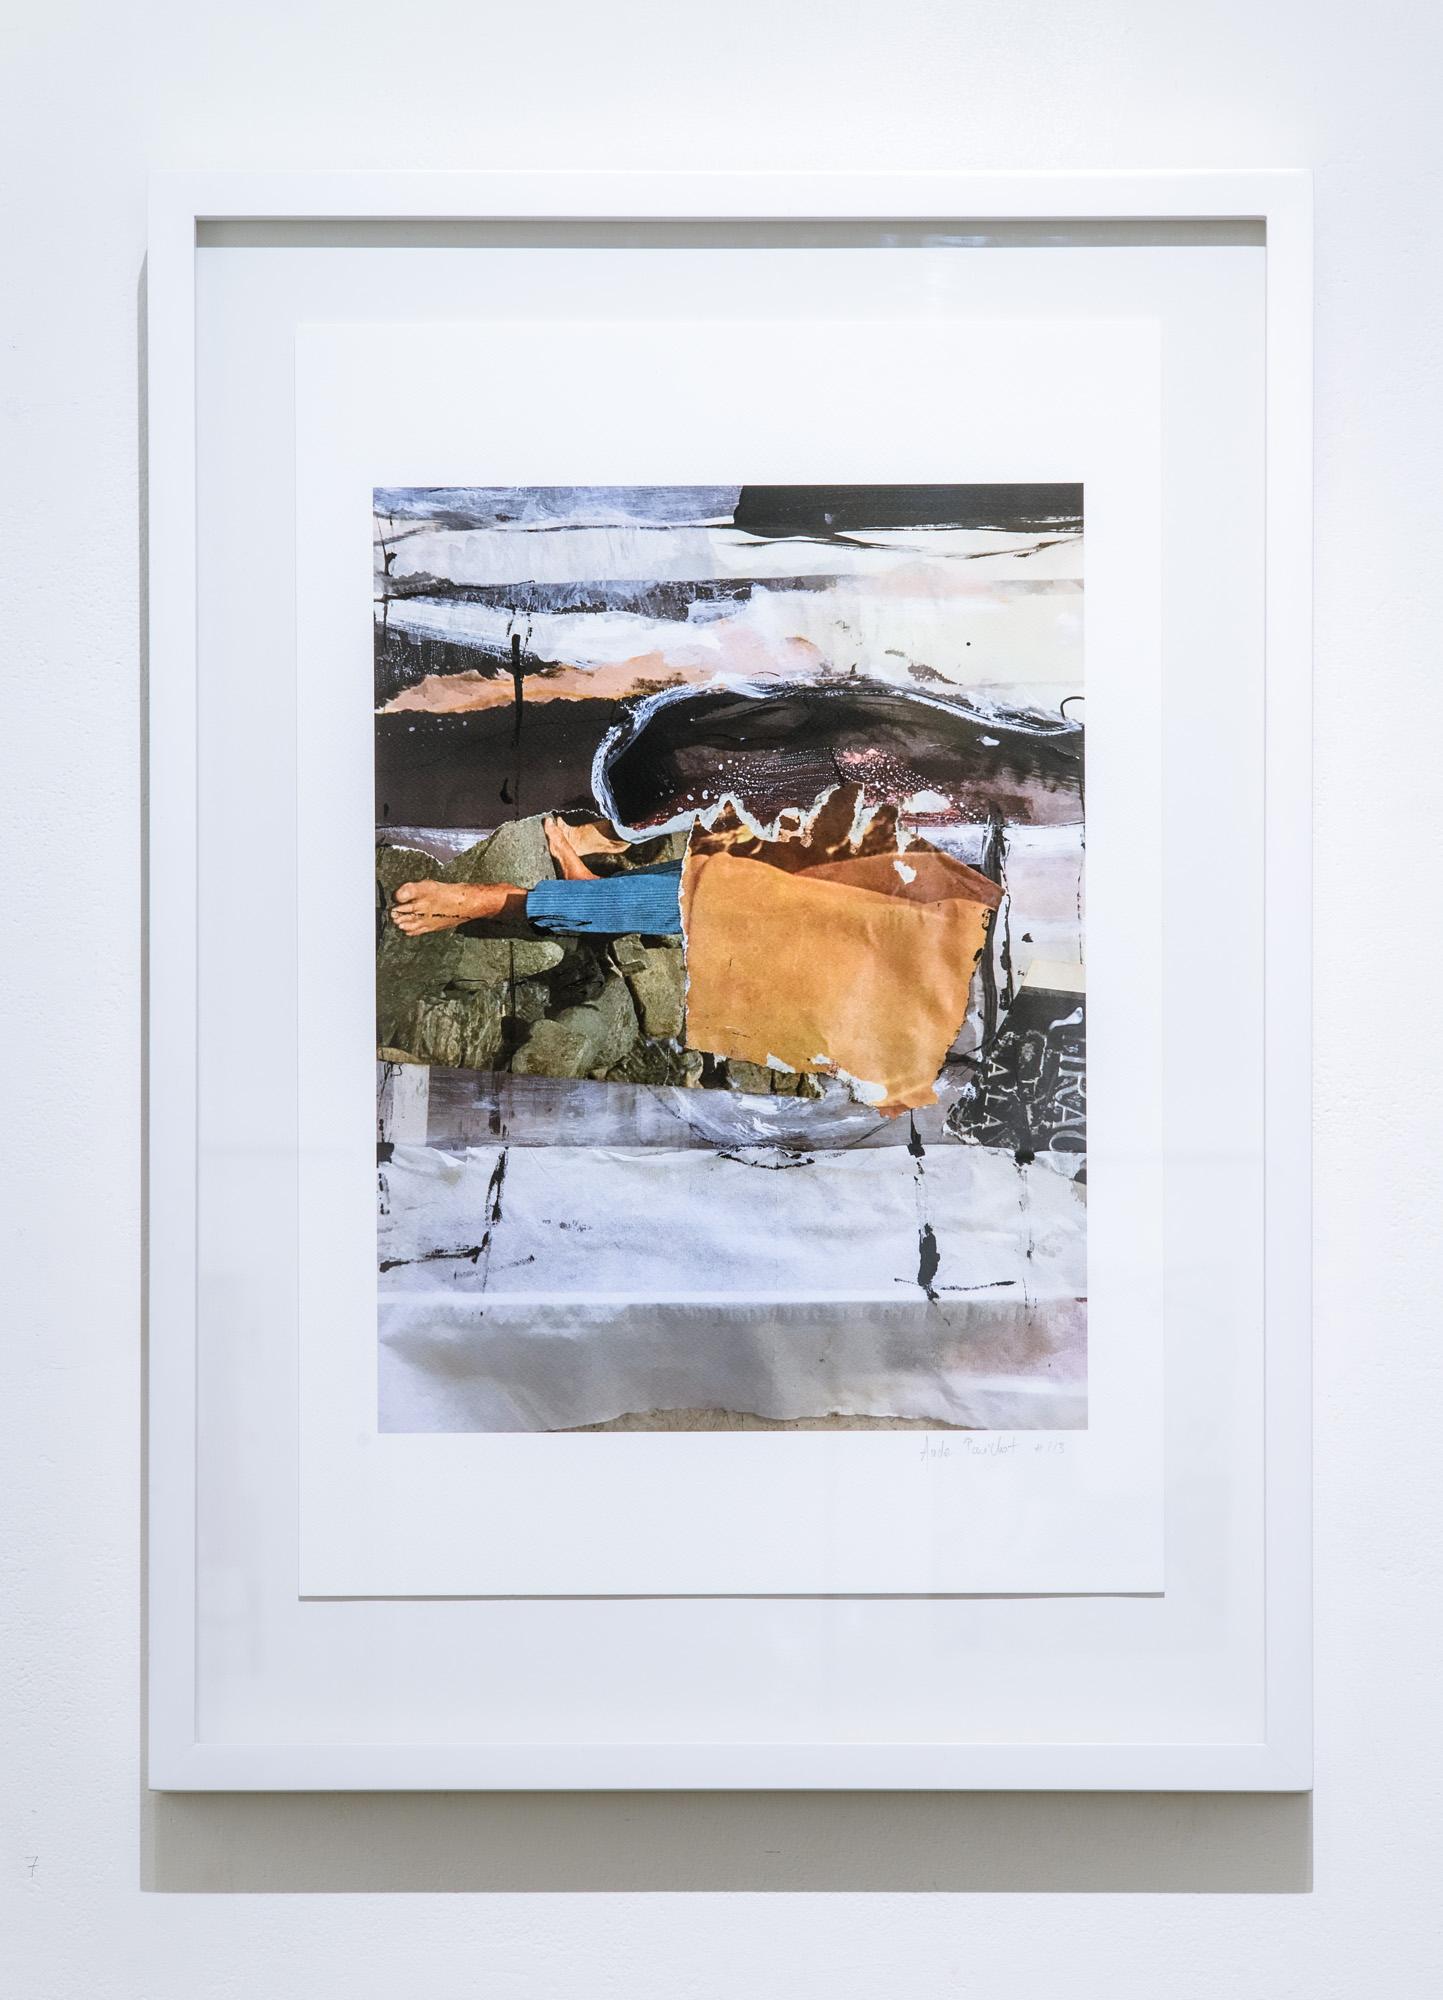 """Walk of life"", Ultra-chrome archival pigments print on aquarelle paper 44cm x 61cm, 2018, Edition of 3 +1AP"